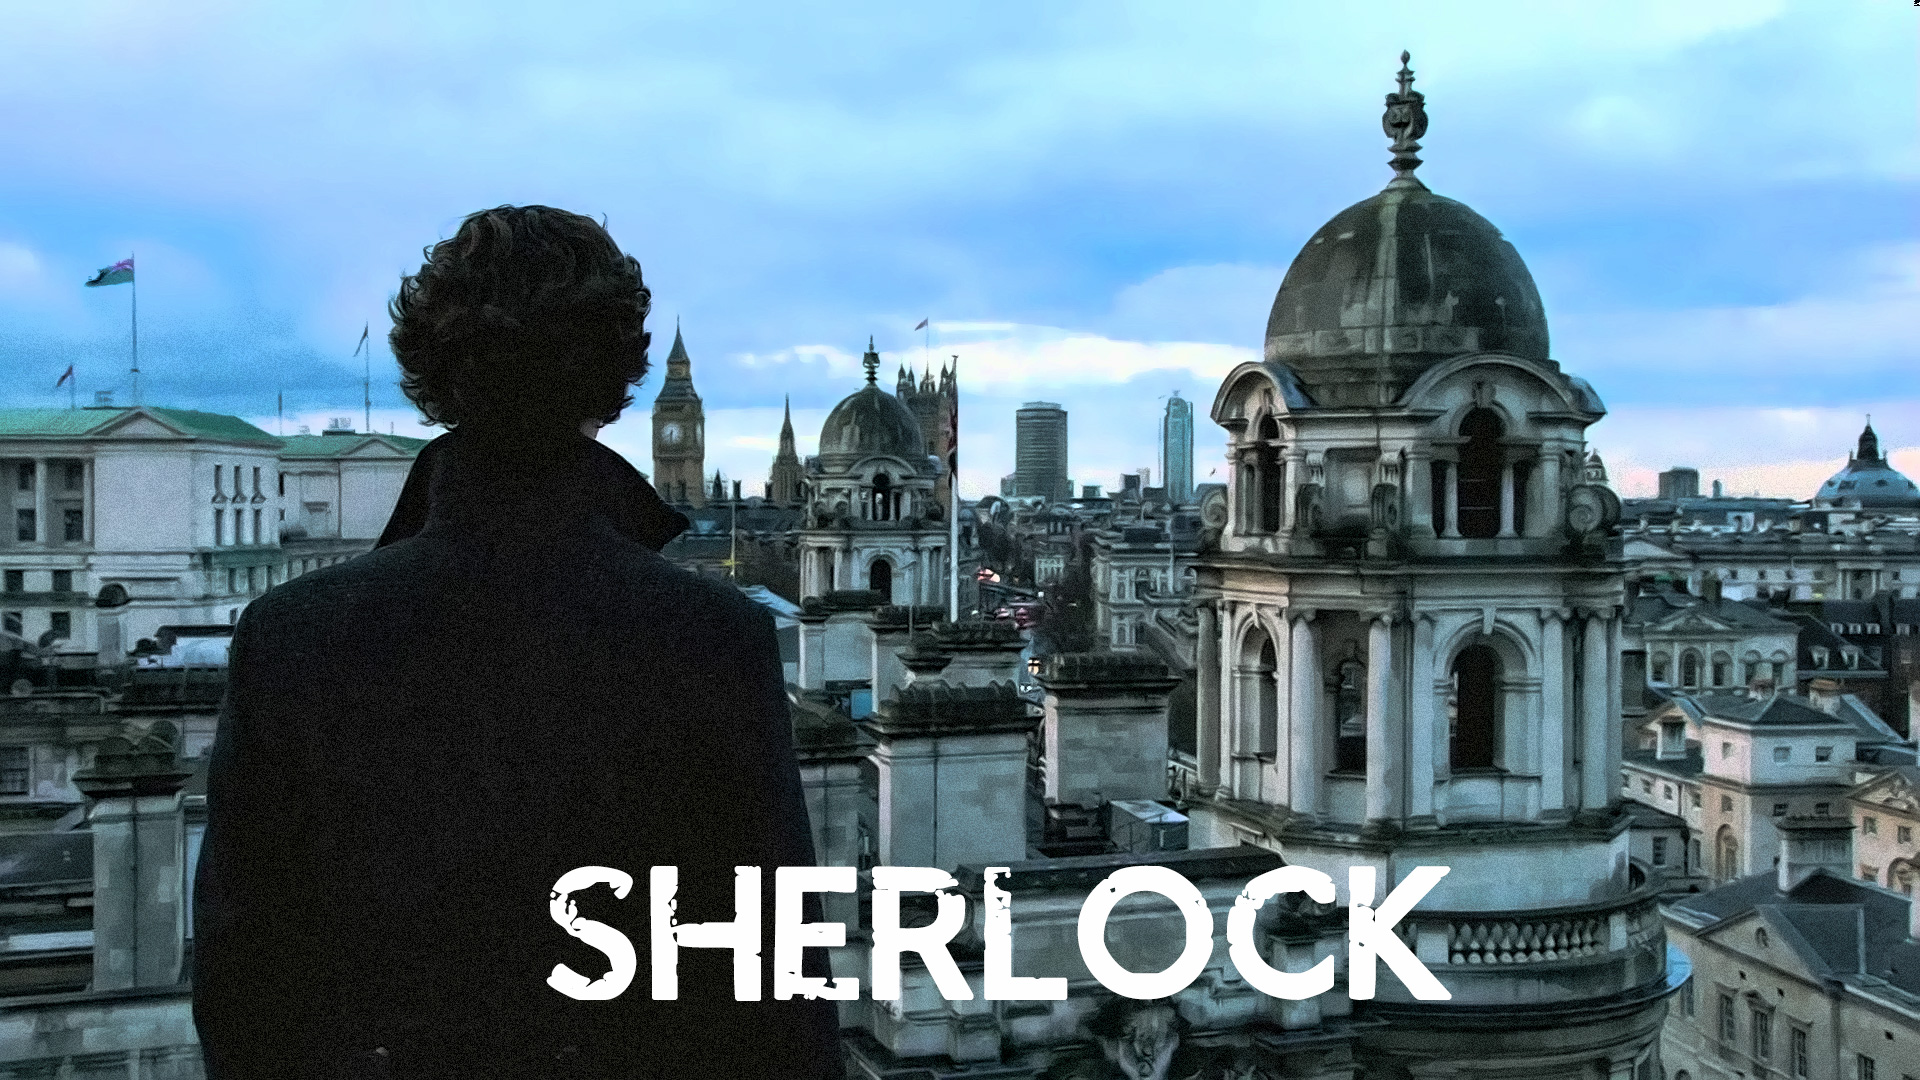 London Sherlock Wallpaper Portrayal of Sherlock a